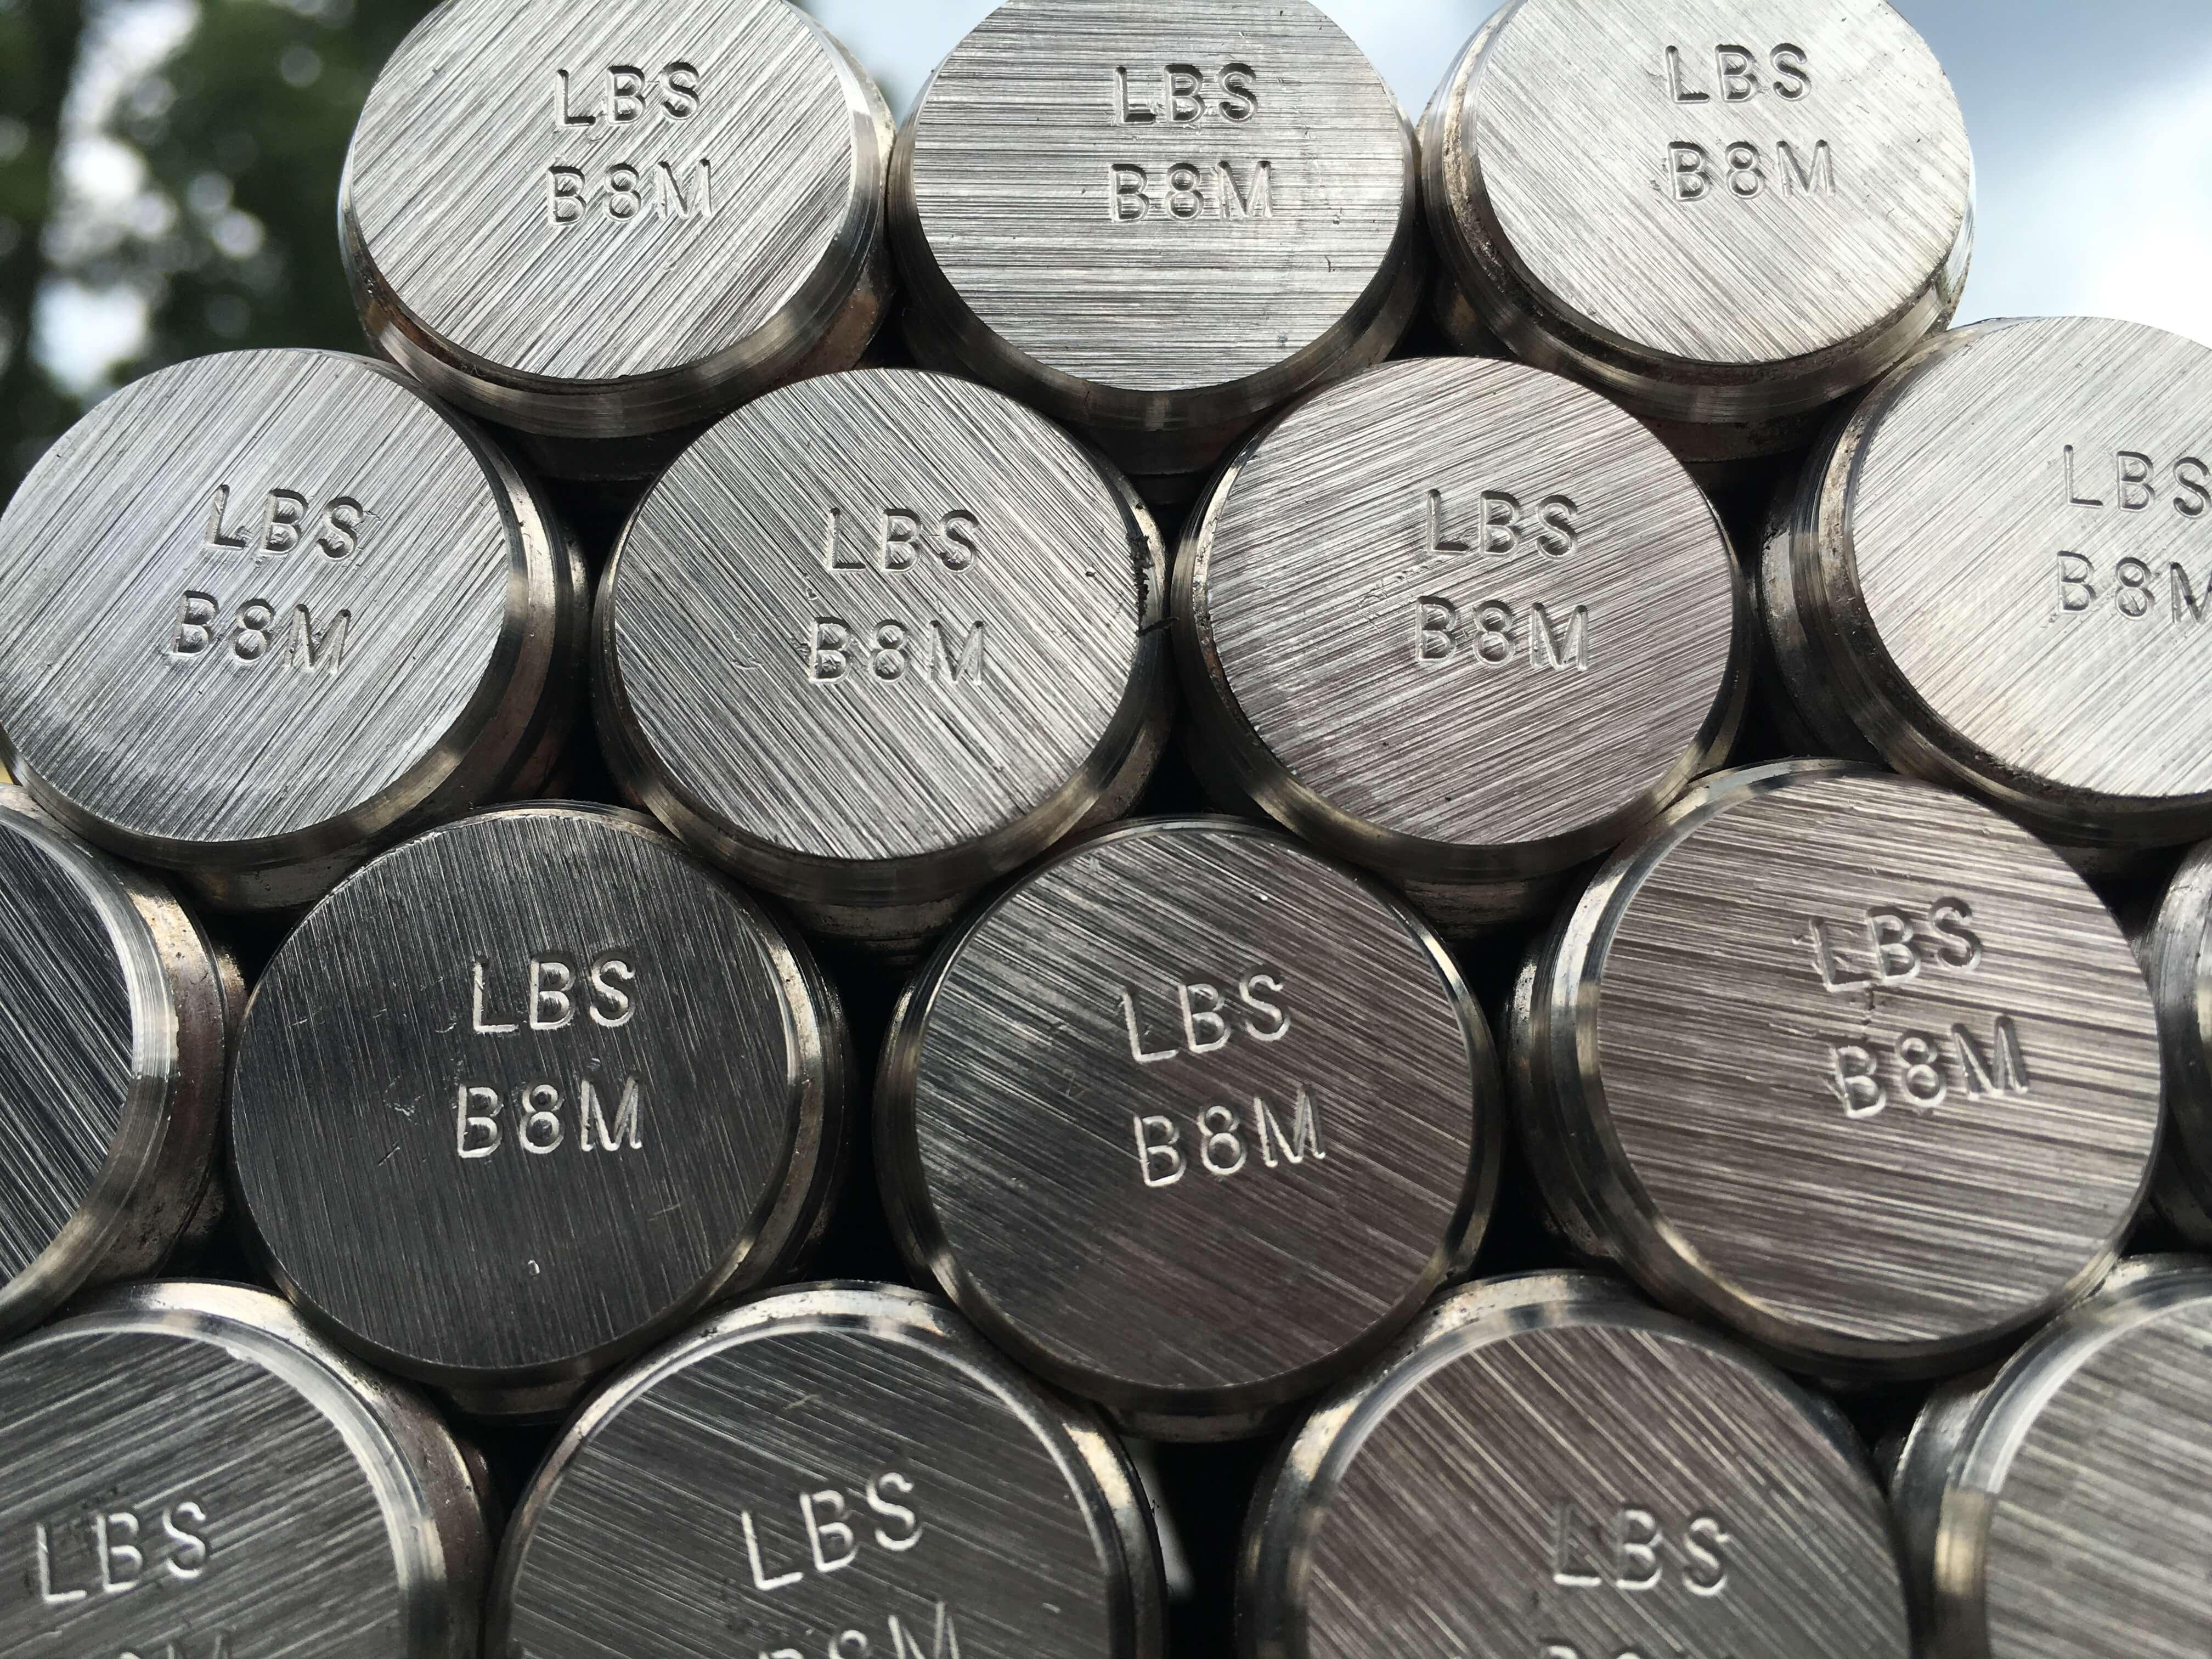 ASTM A193 Grade B8 Stud Bolts